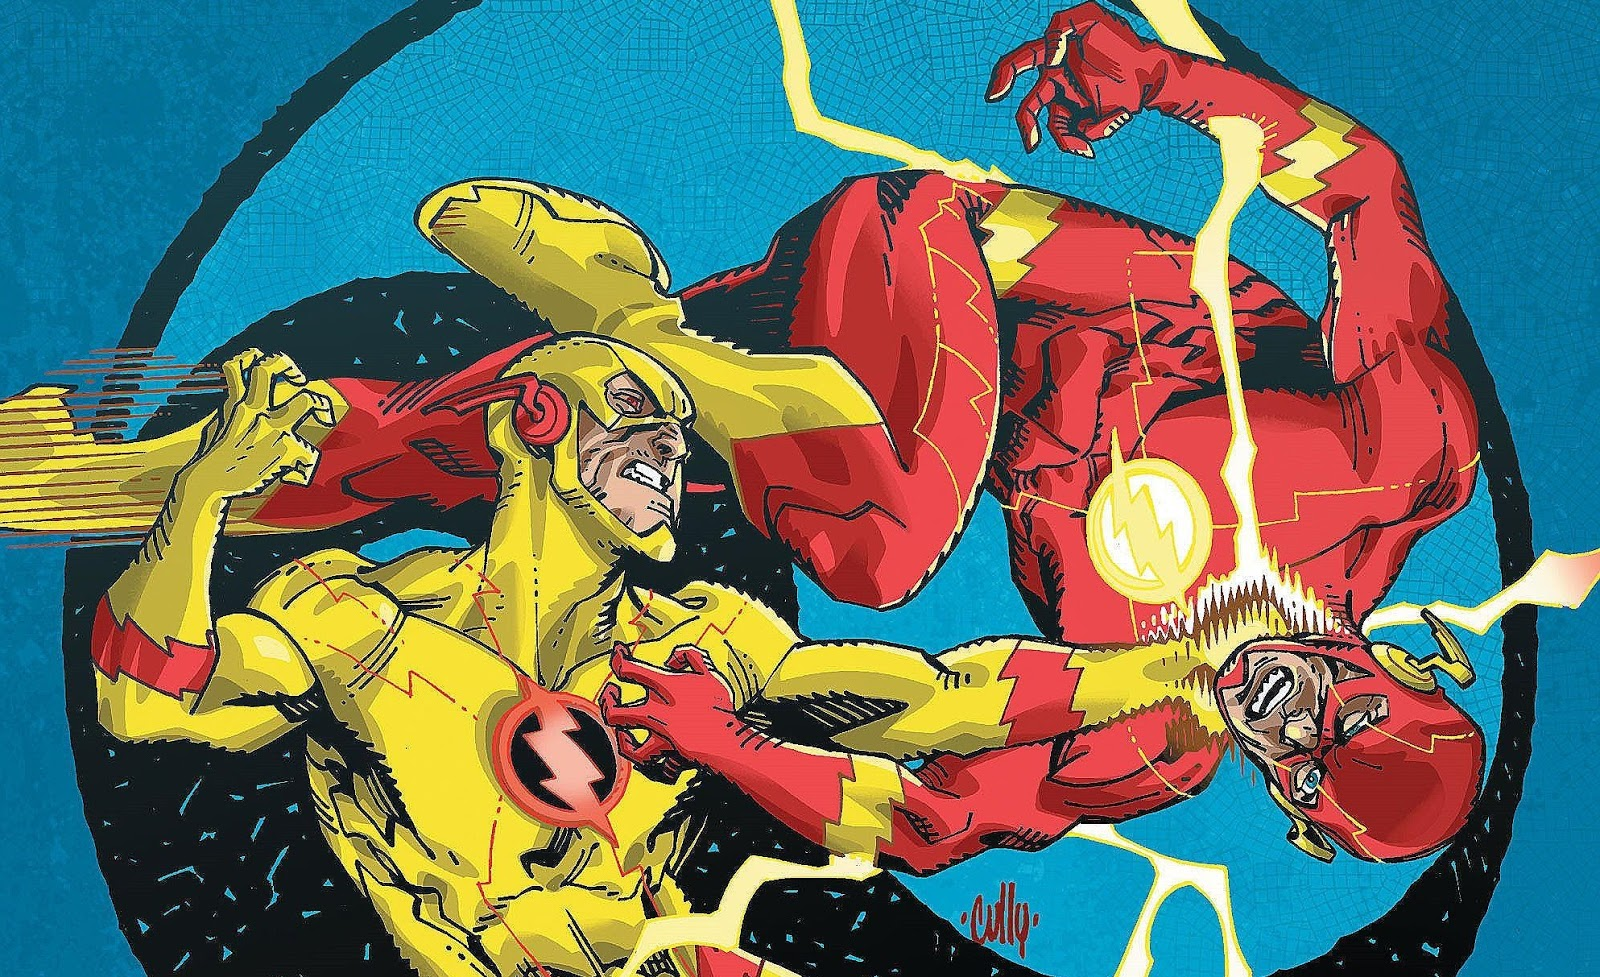 Flash_ Fastest Man Alive #5 (2020) - Page 1gg.jpg